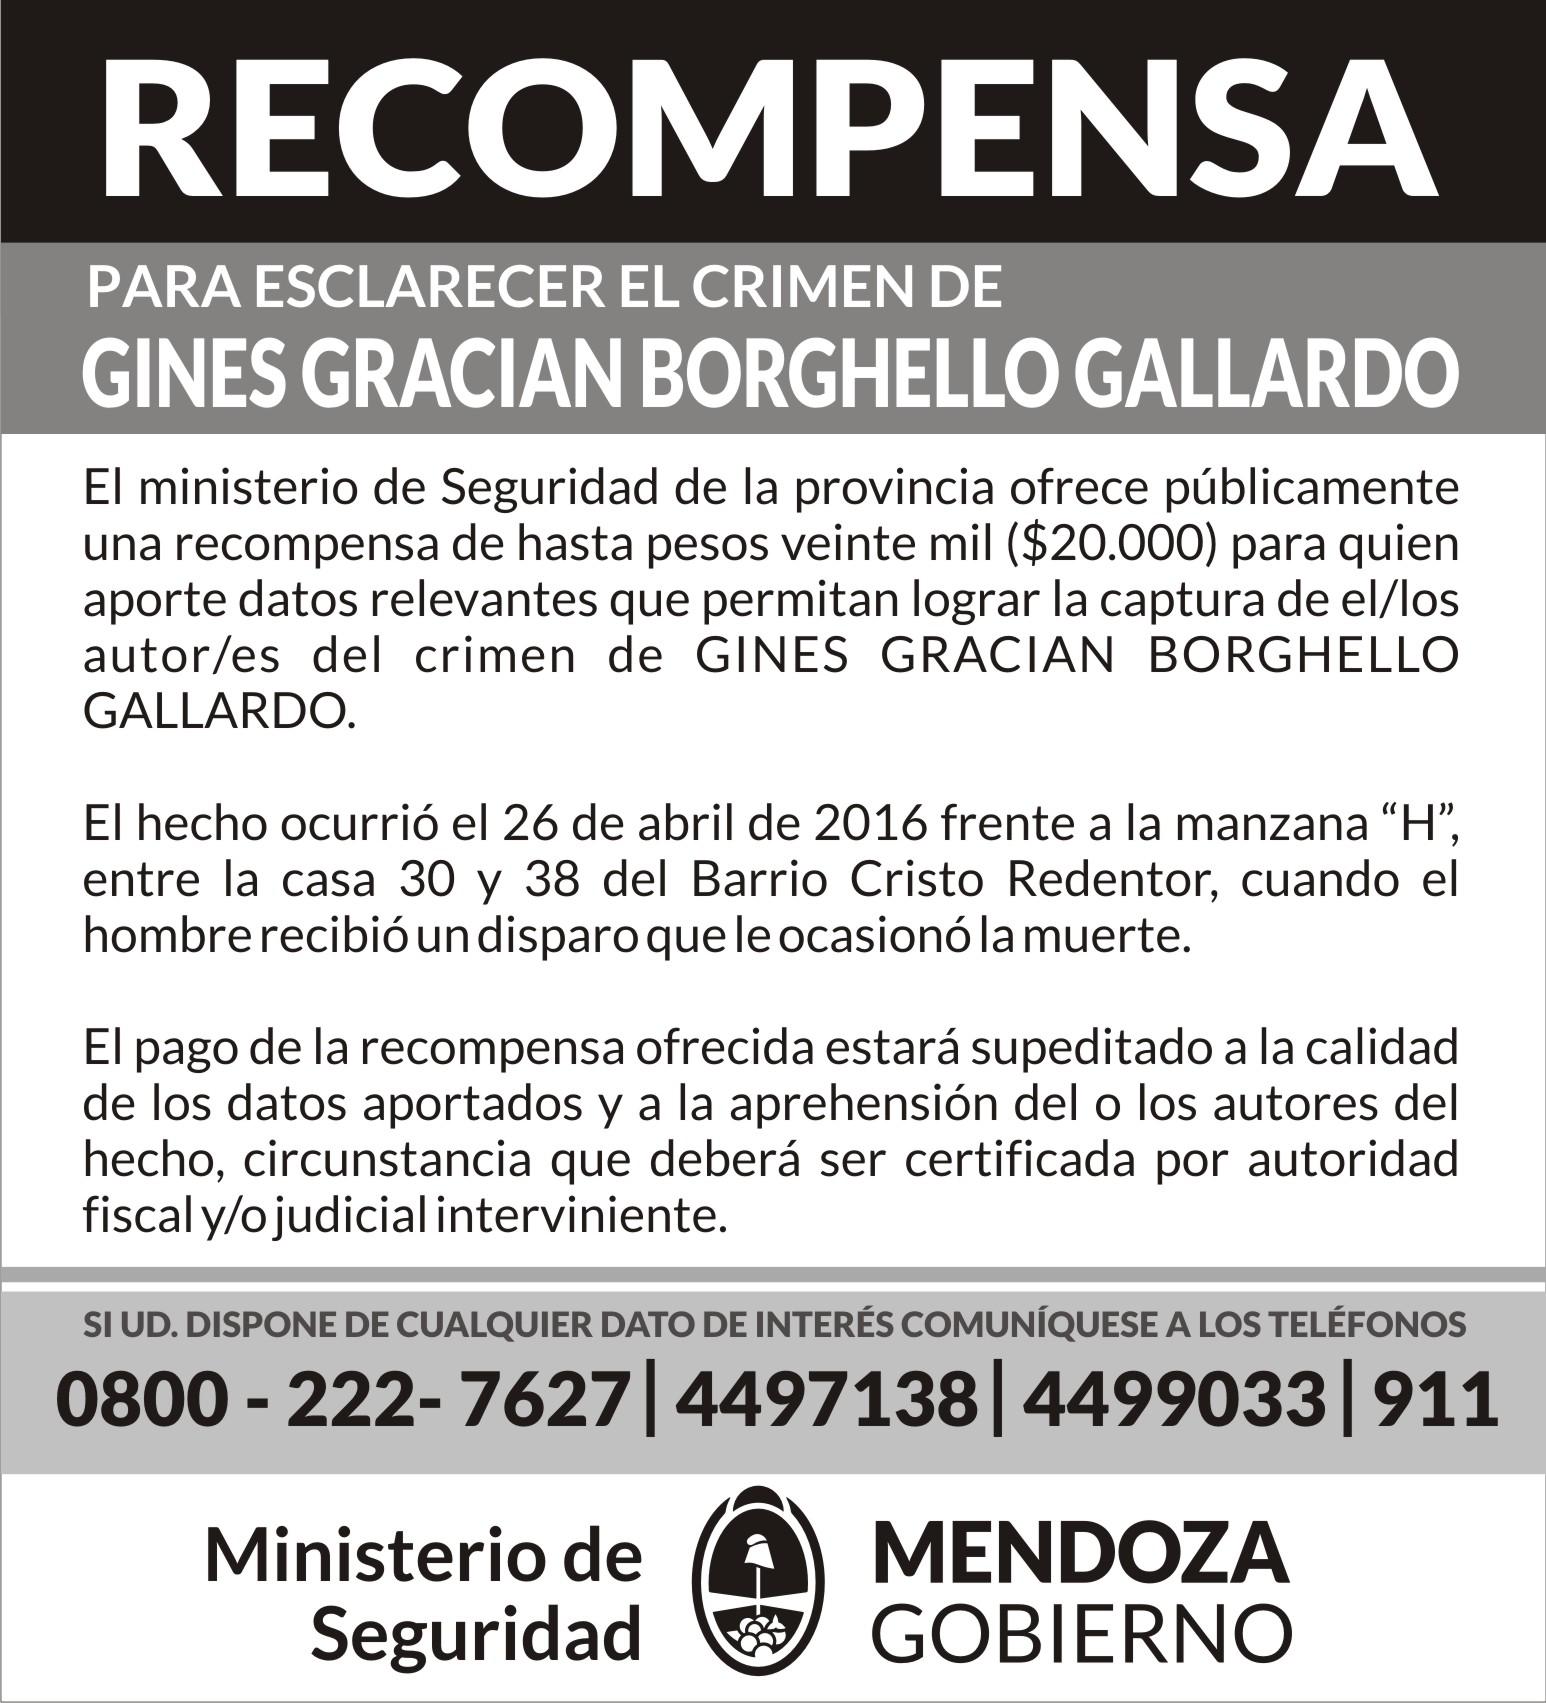 recompensa_BORGHELLO_LOS_ANDES_3x4